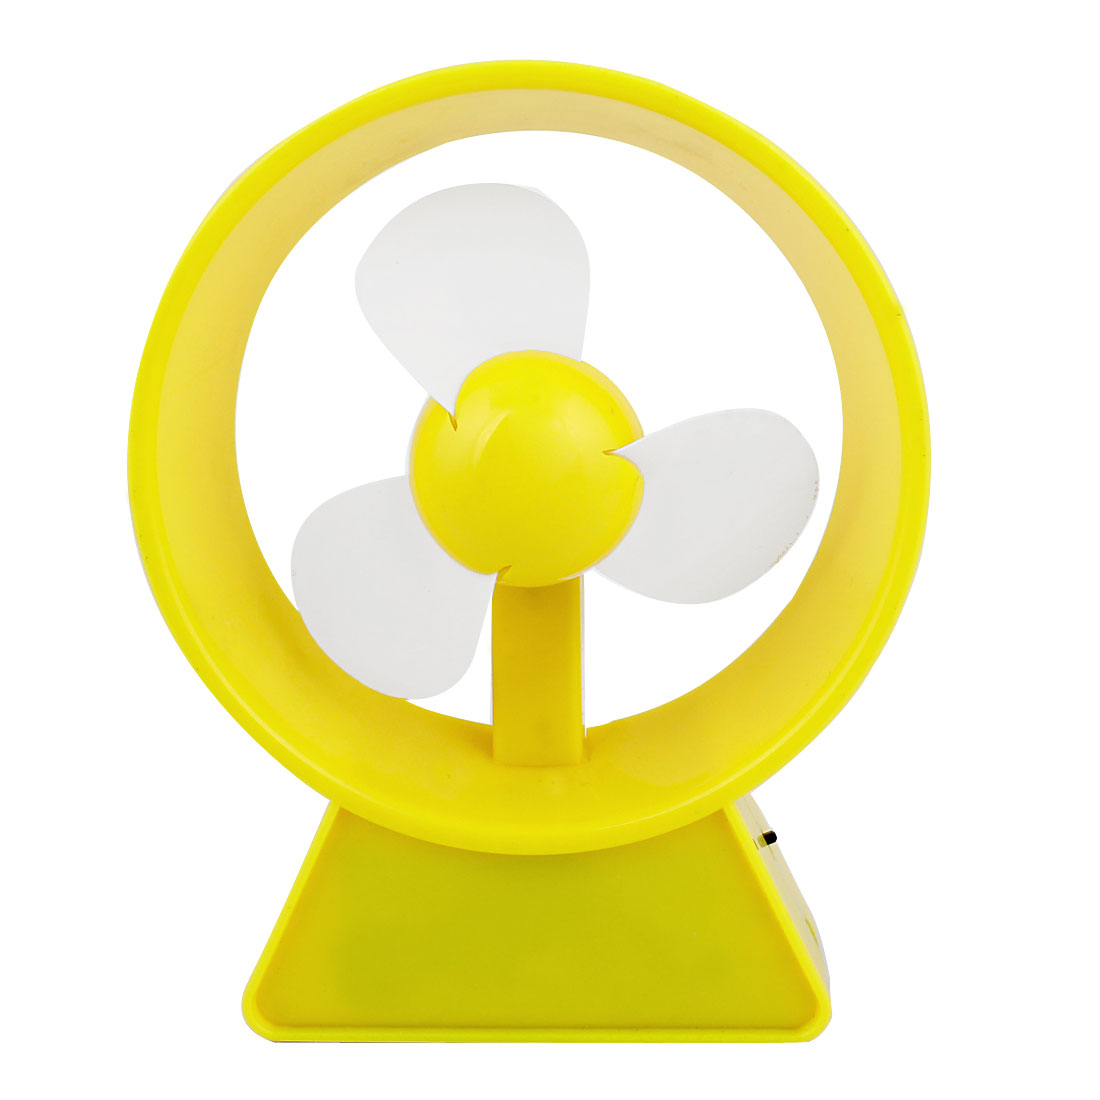 Handy Desktop Notebook Yellow Plastic Round Frame USB Battery Mini Fan